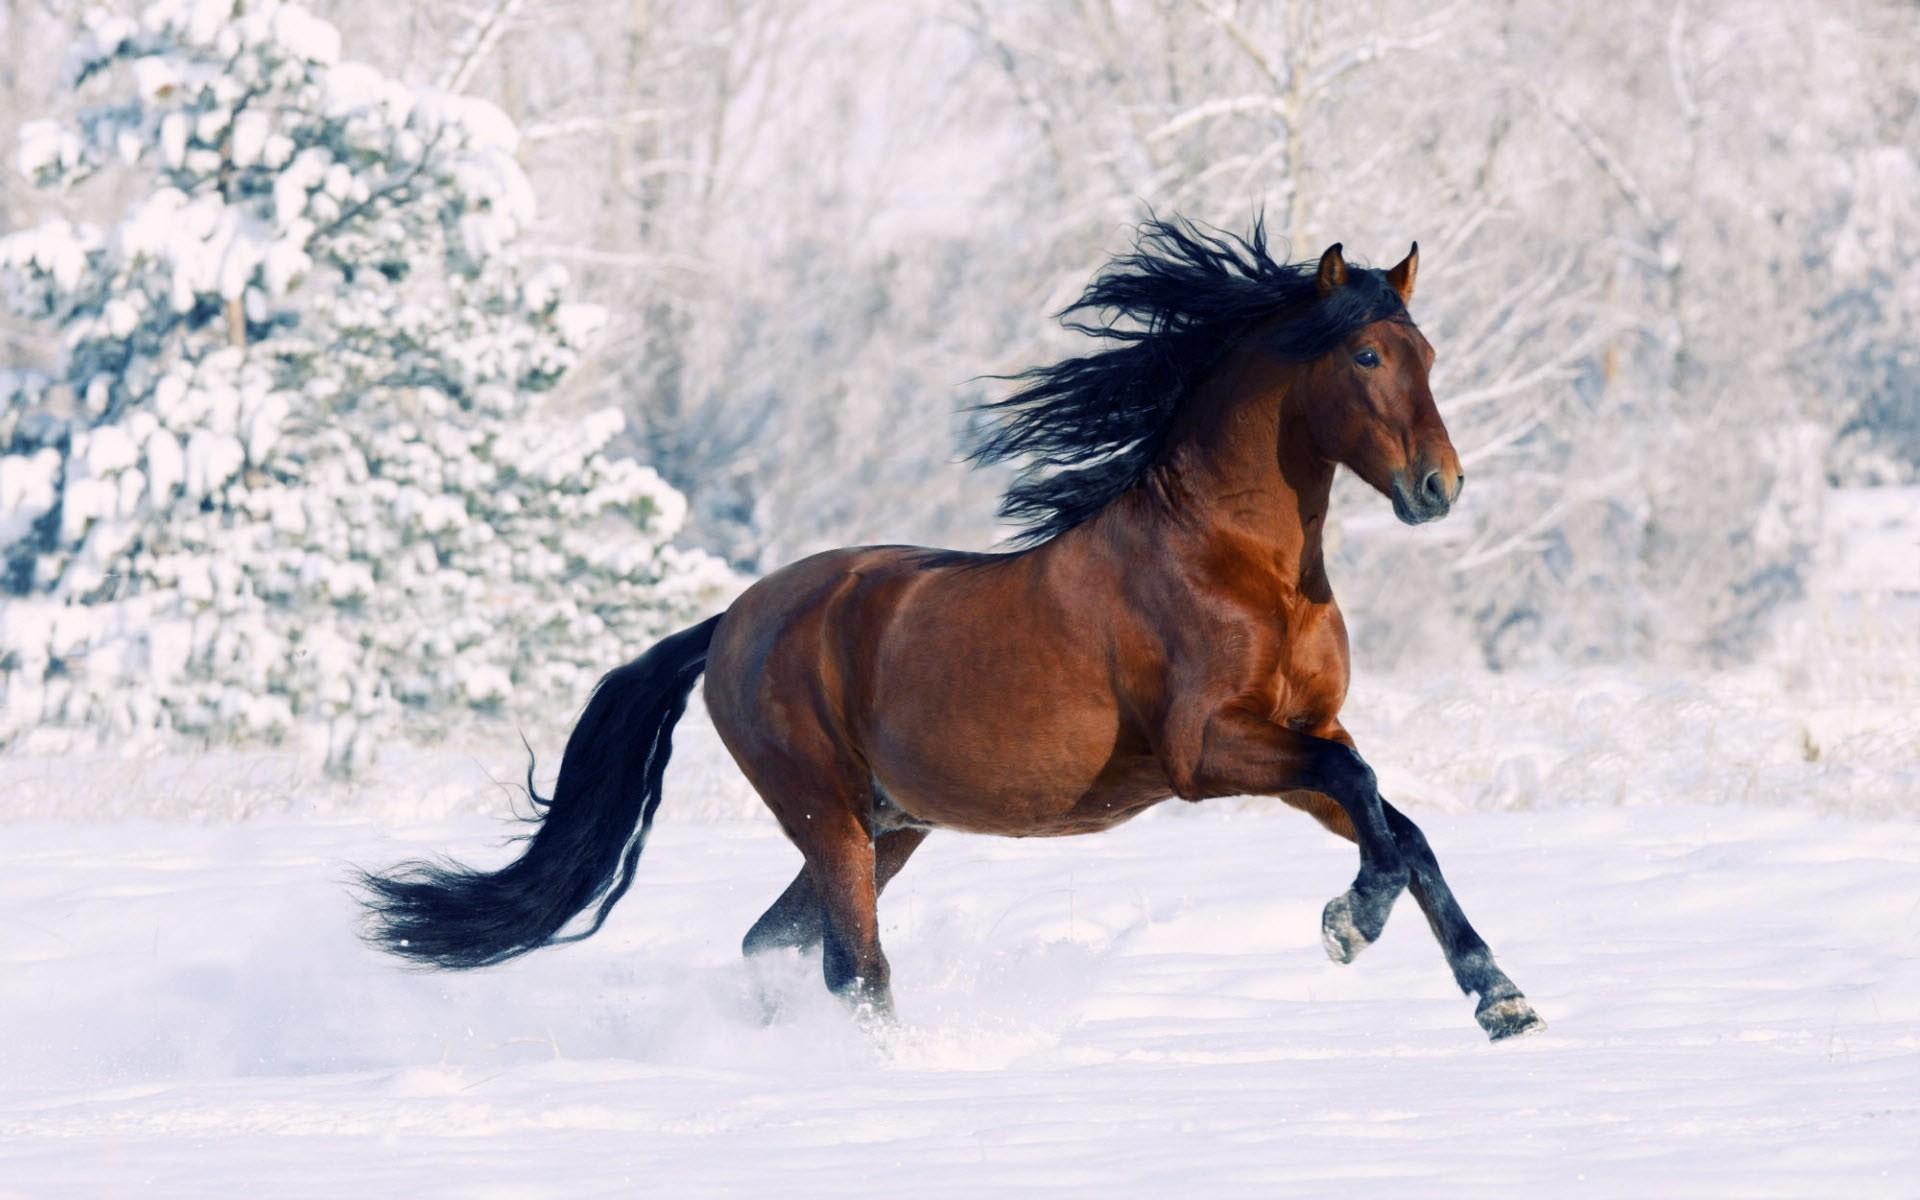 Pretty Horse Wallpapers Nosirix